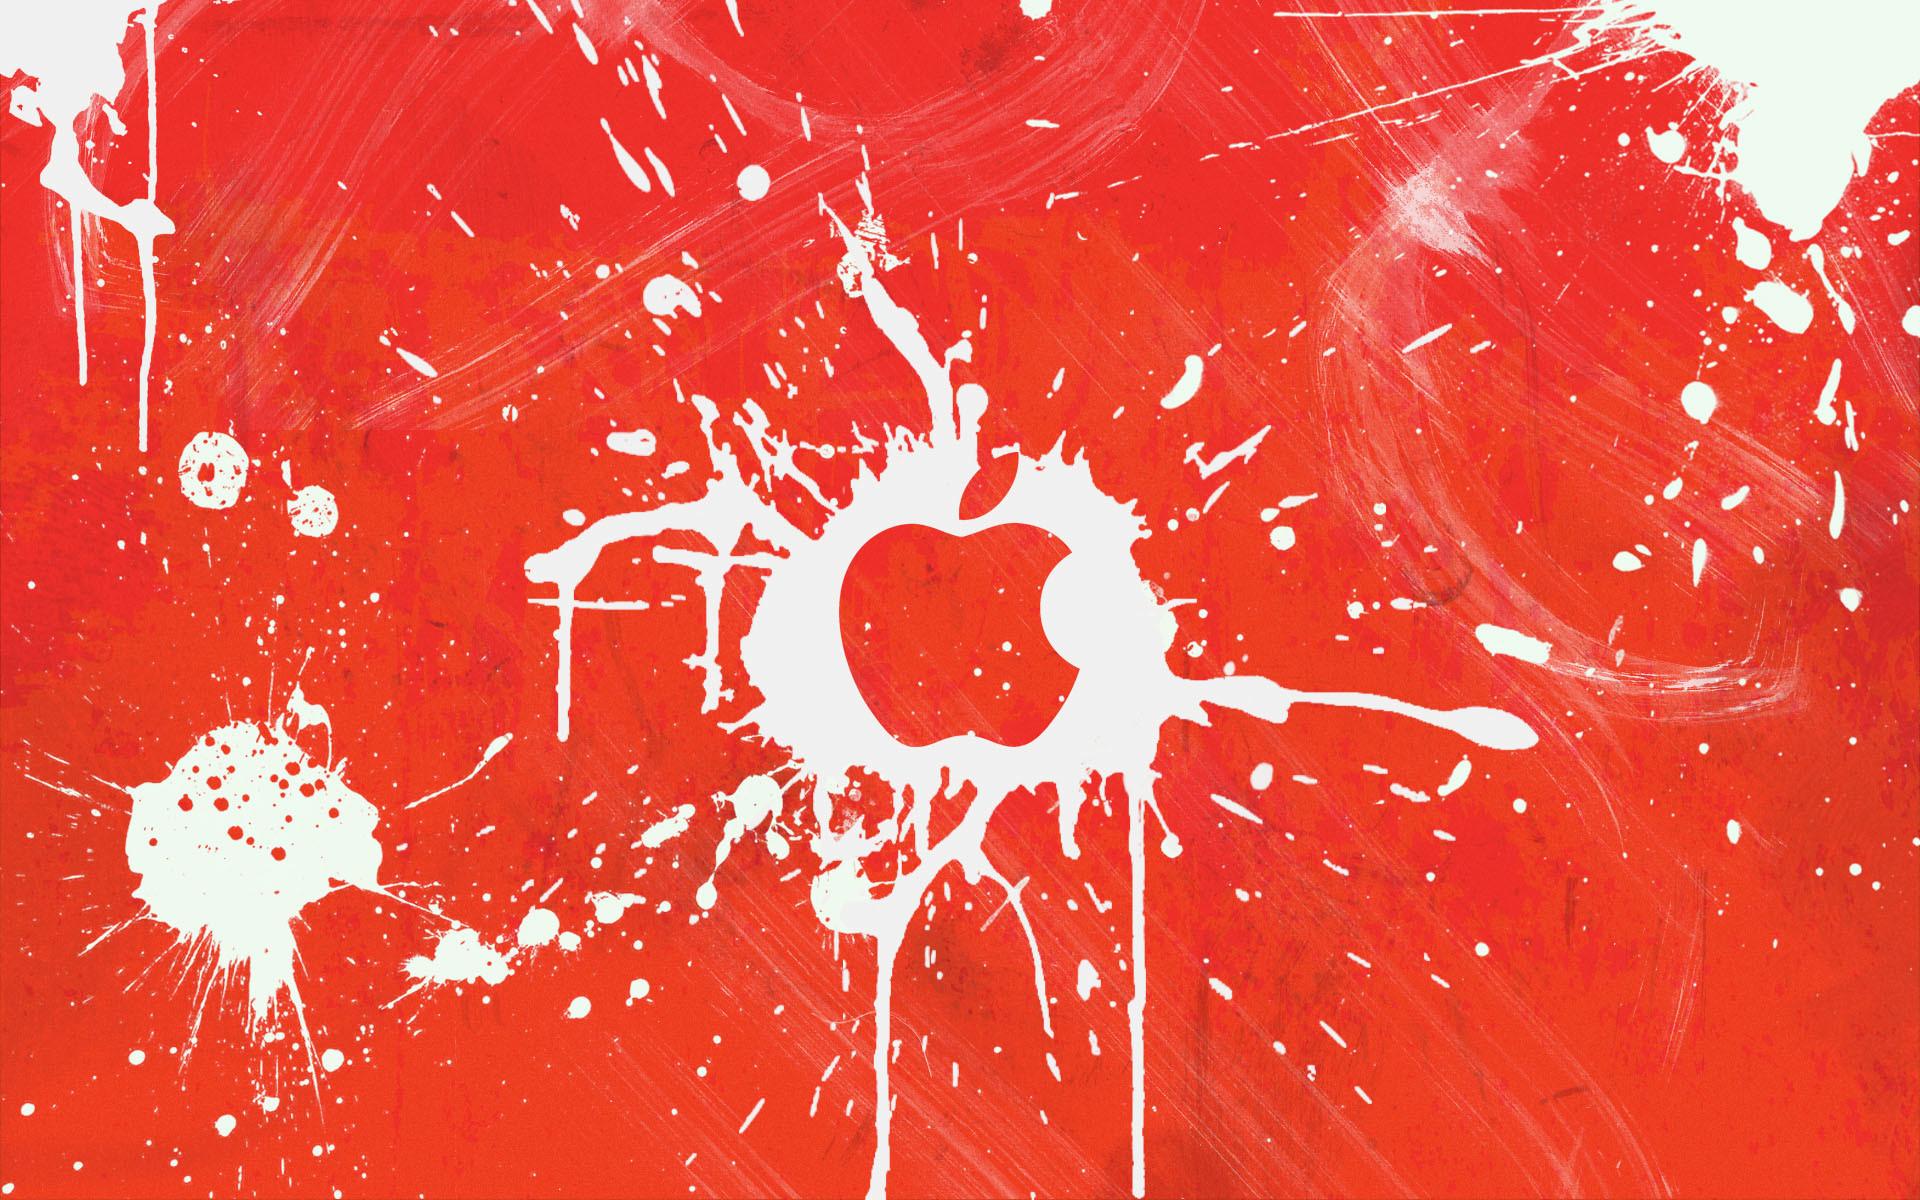 Cool Macbook Pro Backgrounds – Wallpaper Zone